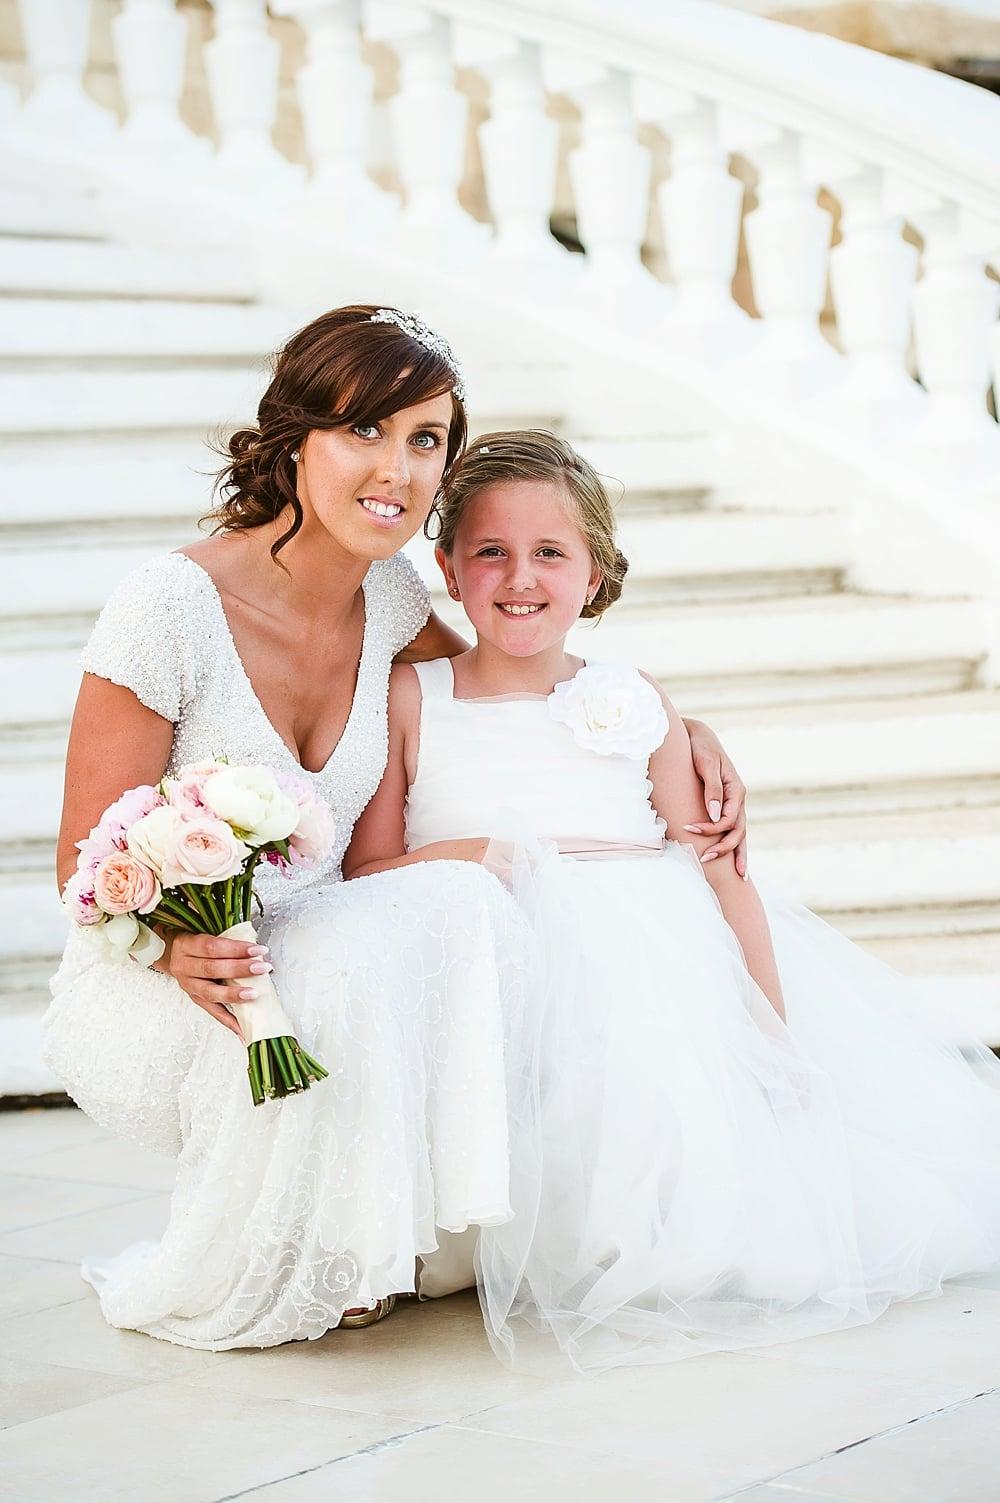 Elaine & Shane - Westin Dragonara Wedding - Wedding Photography Malta